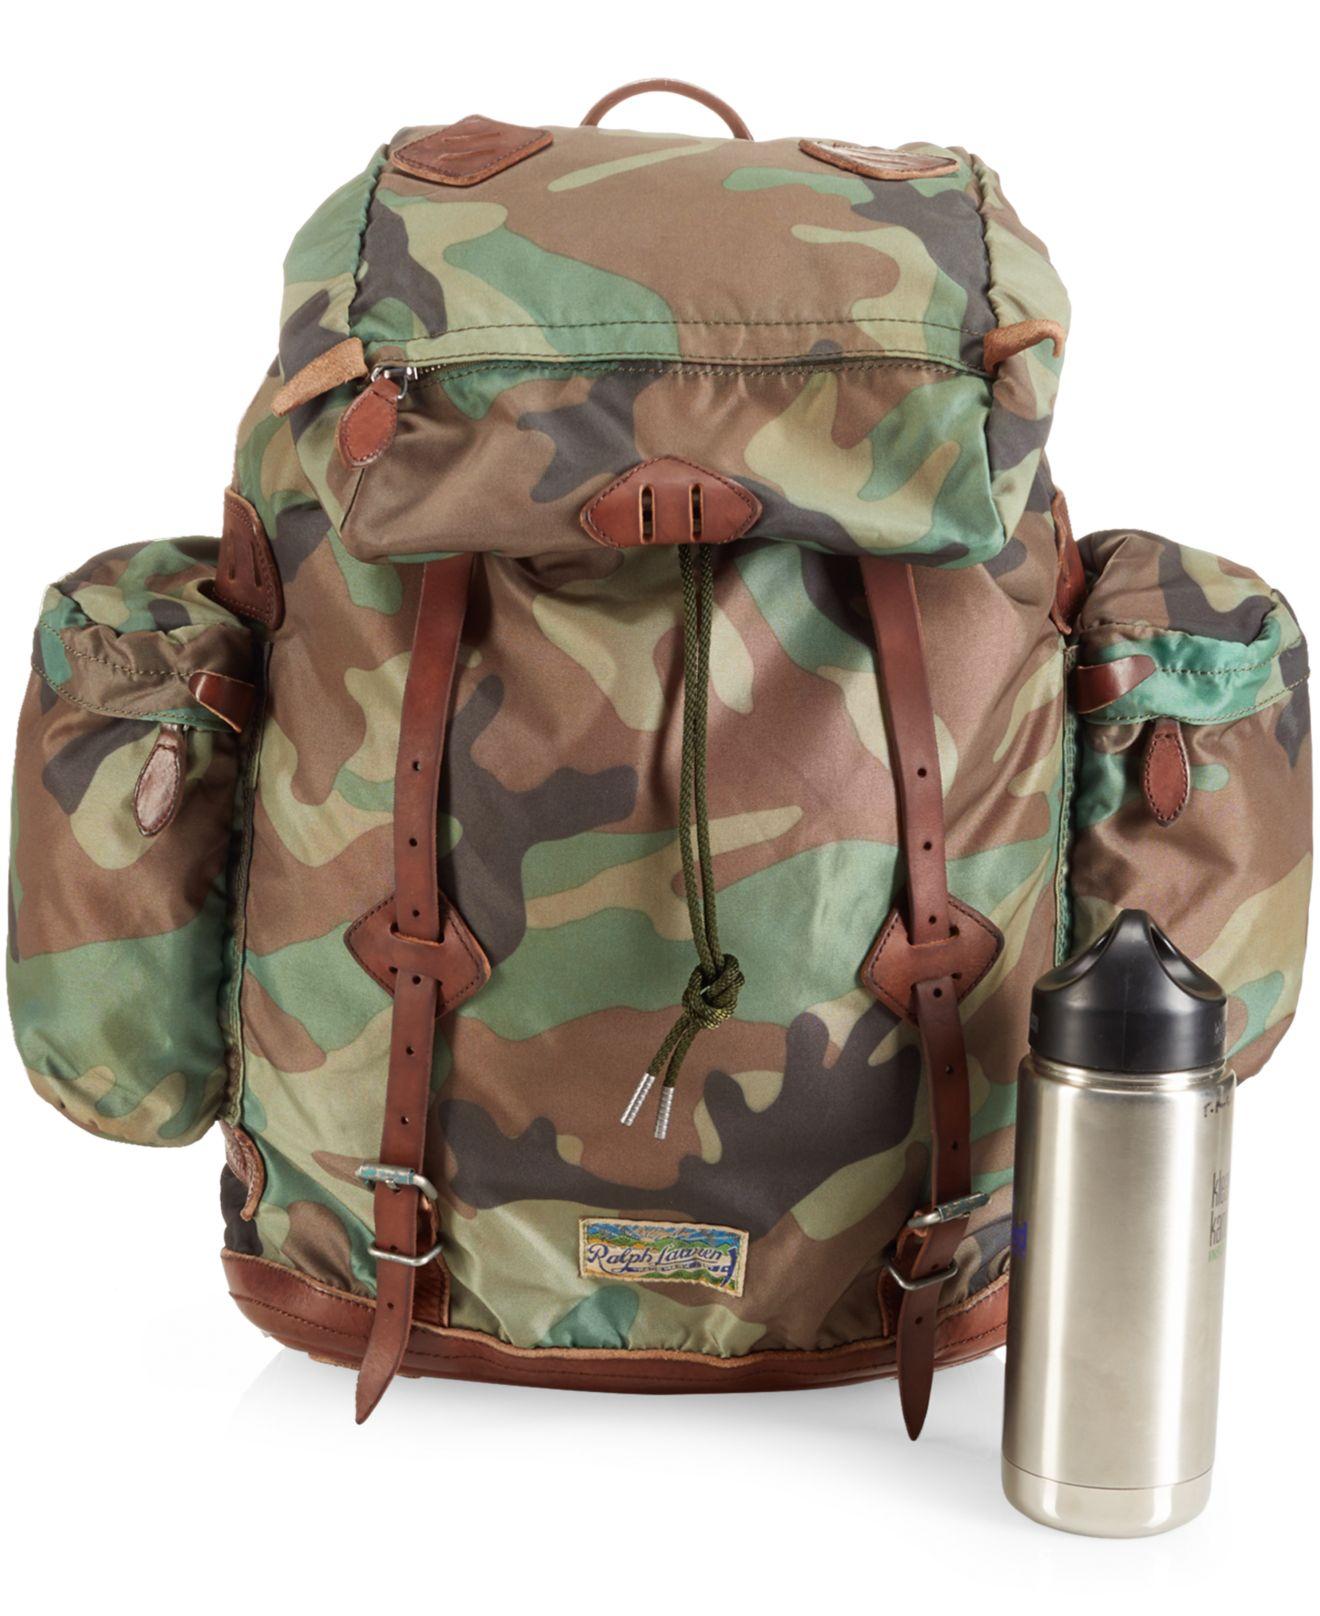 18001f1f39a Lyst - Polo Ralph Lauren Yosemite Nylon Camo Backpack in Green for Men